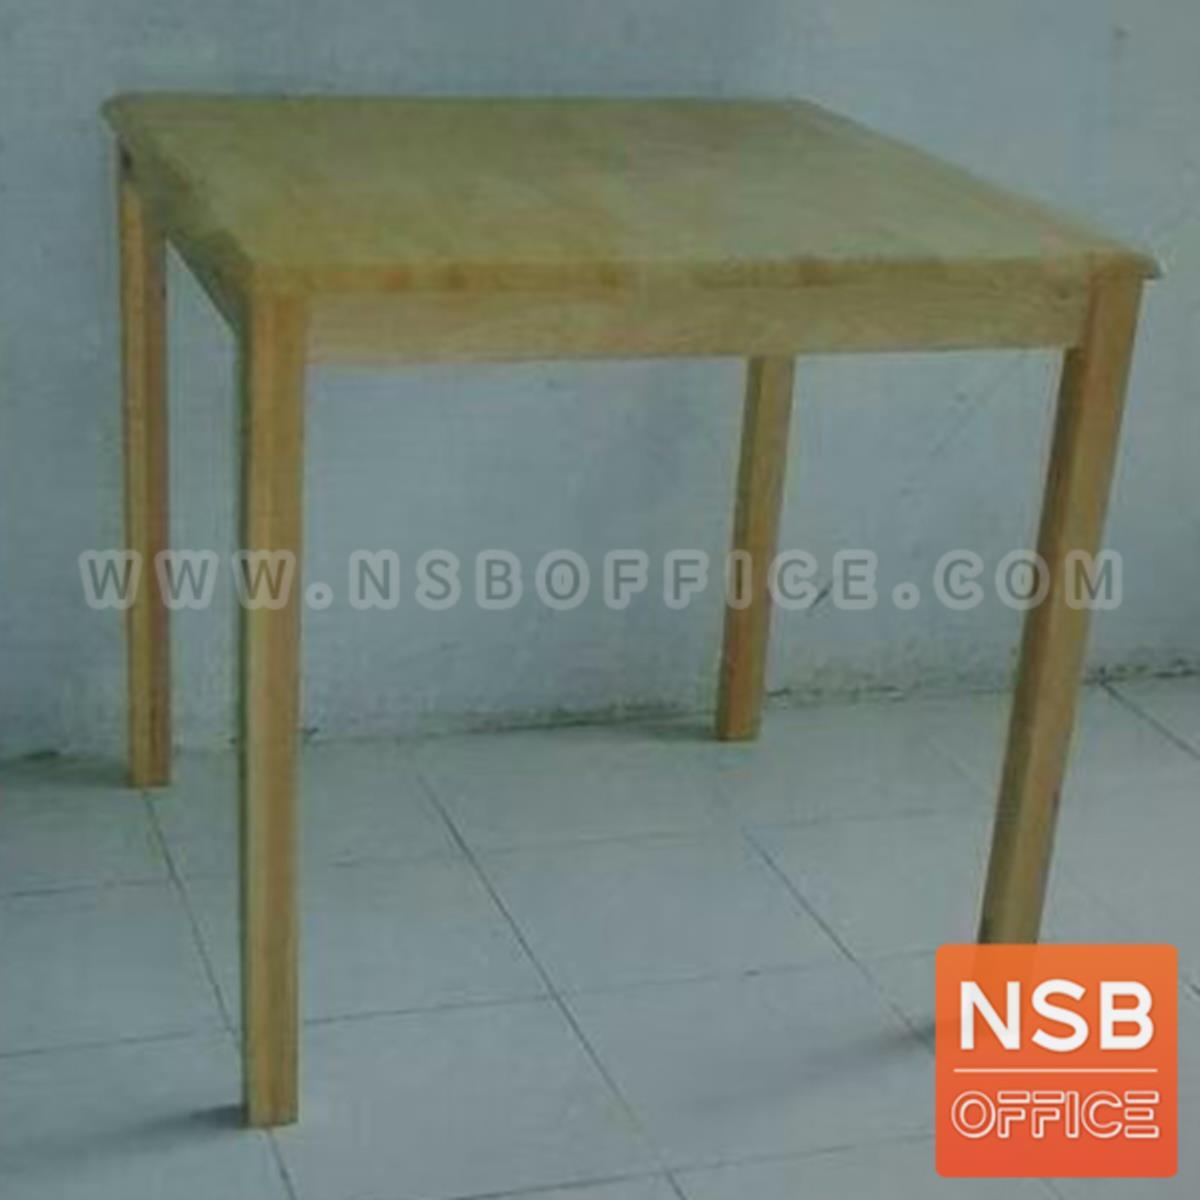 G20A002:โต๊ะอาหารเหลี่ยมไม้ยางพารา รุ่น Allida (อัลลิดา) ขนาด 75Di*75H cm.